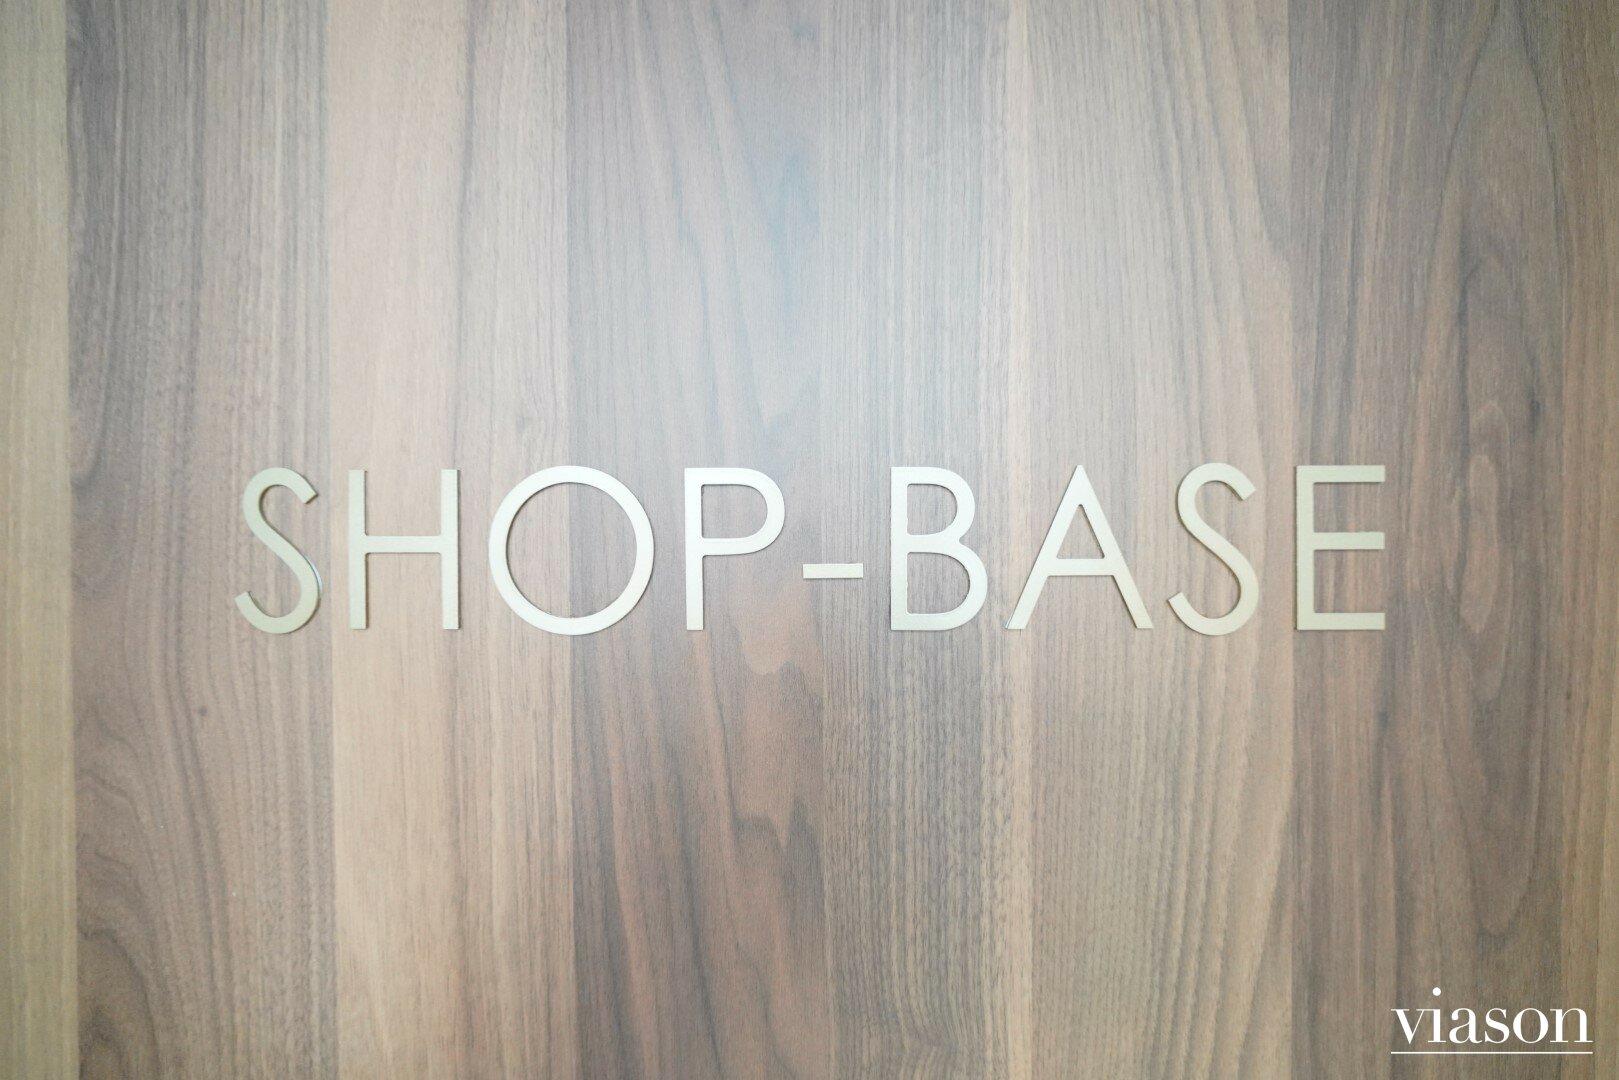 Shop Base